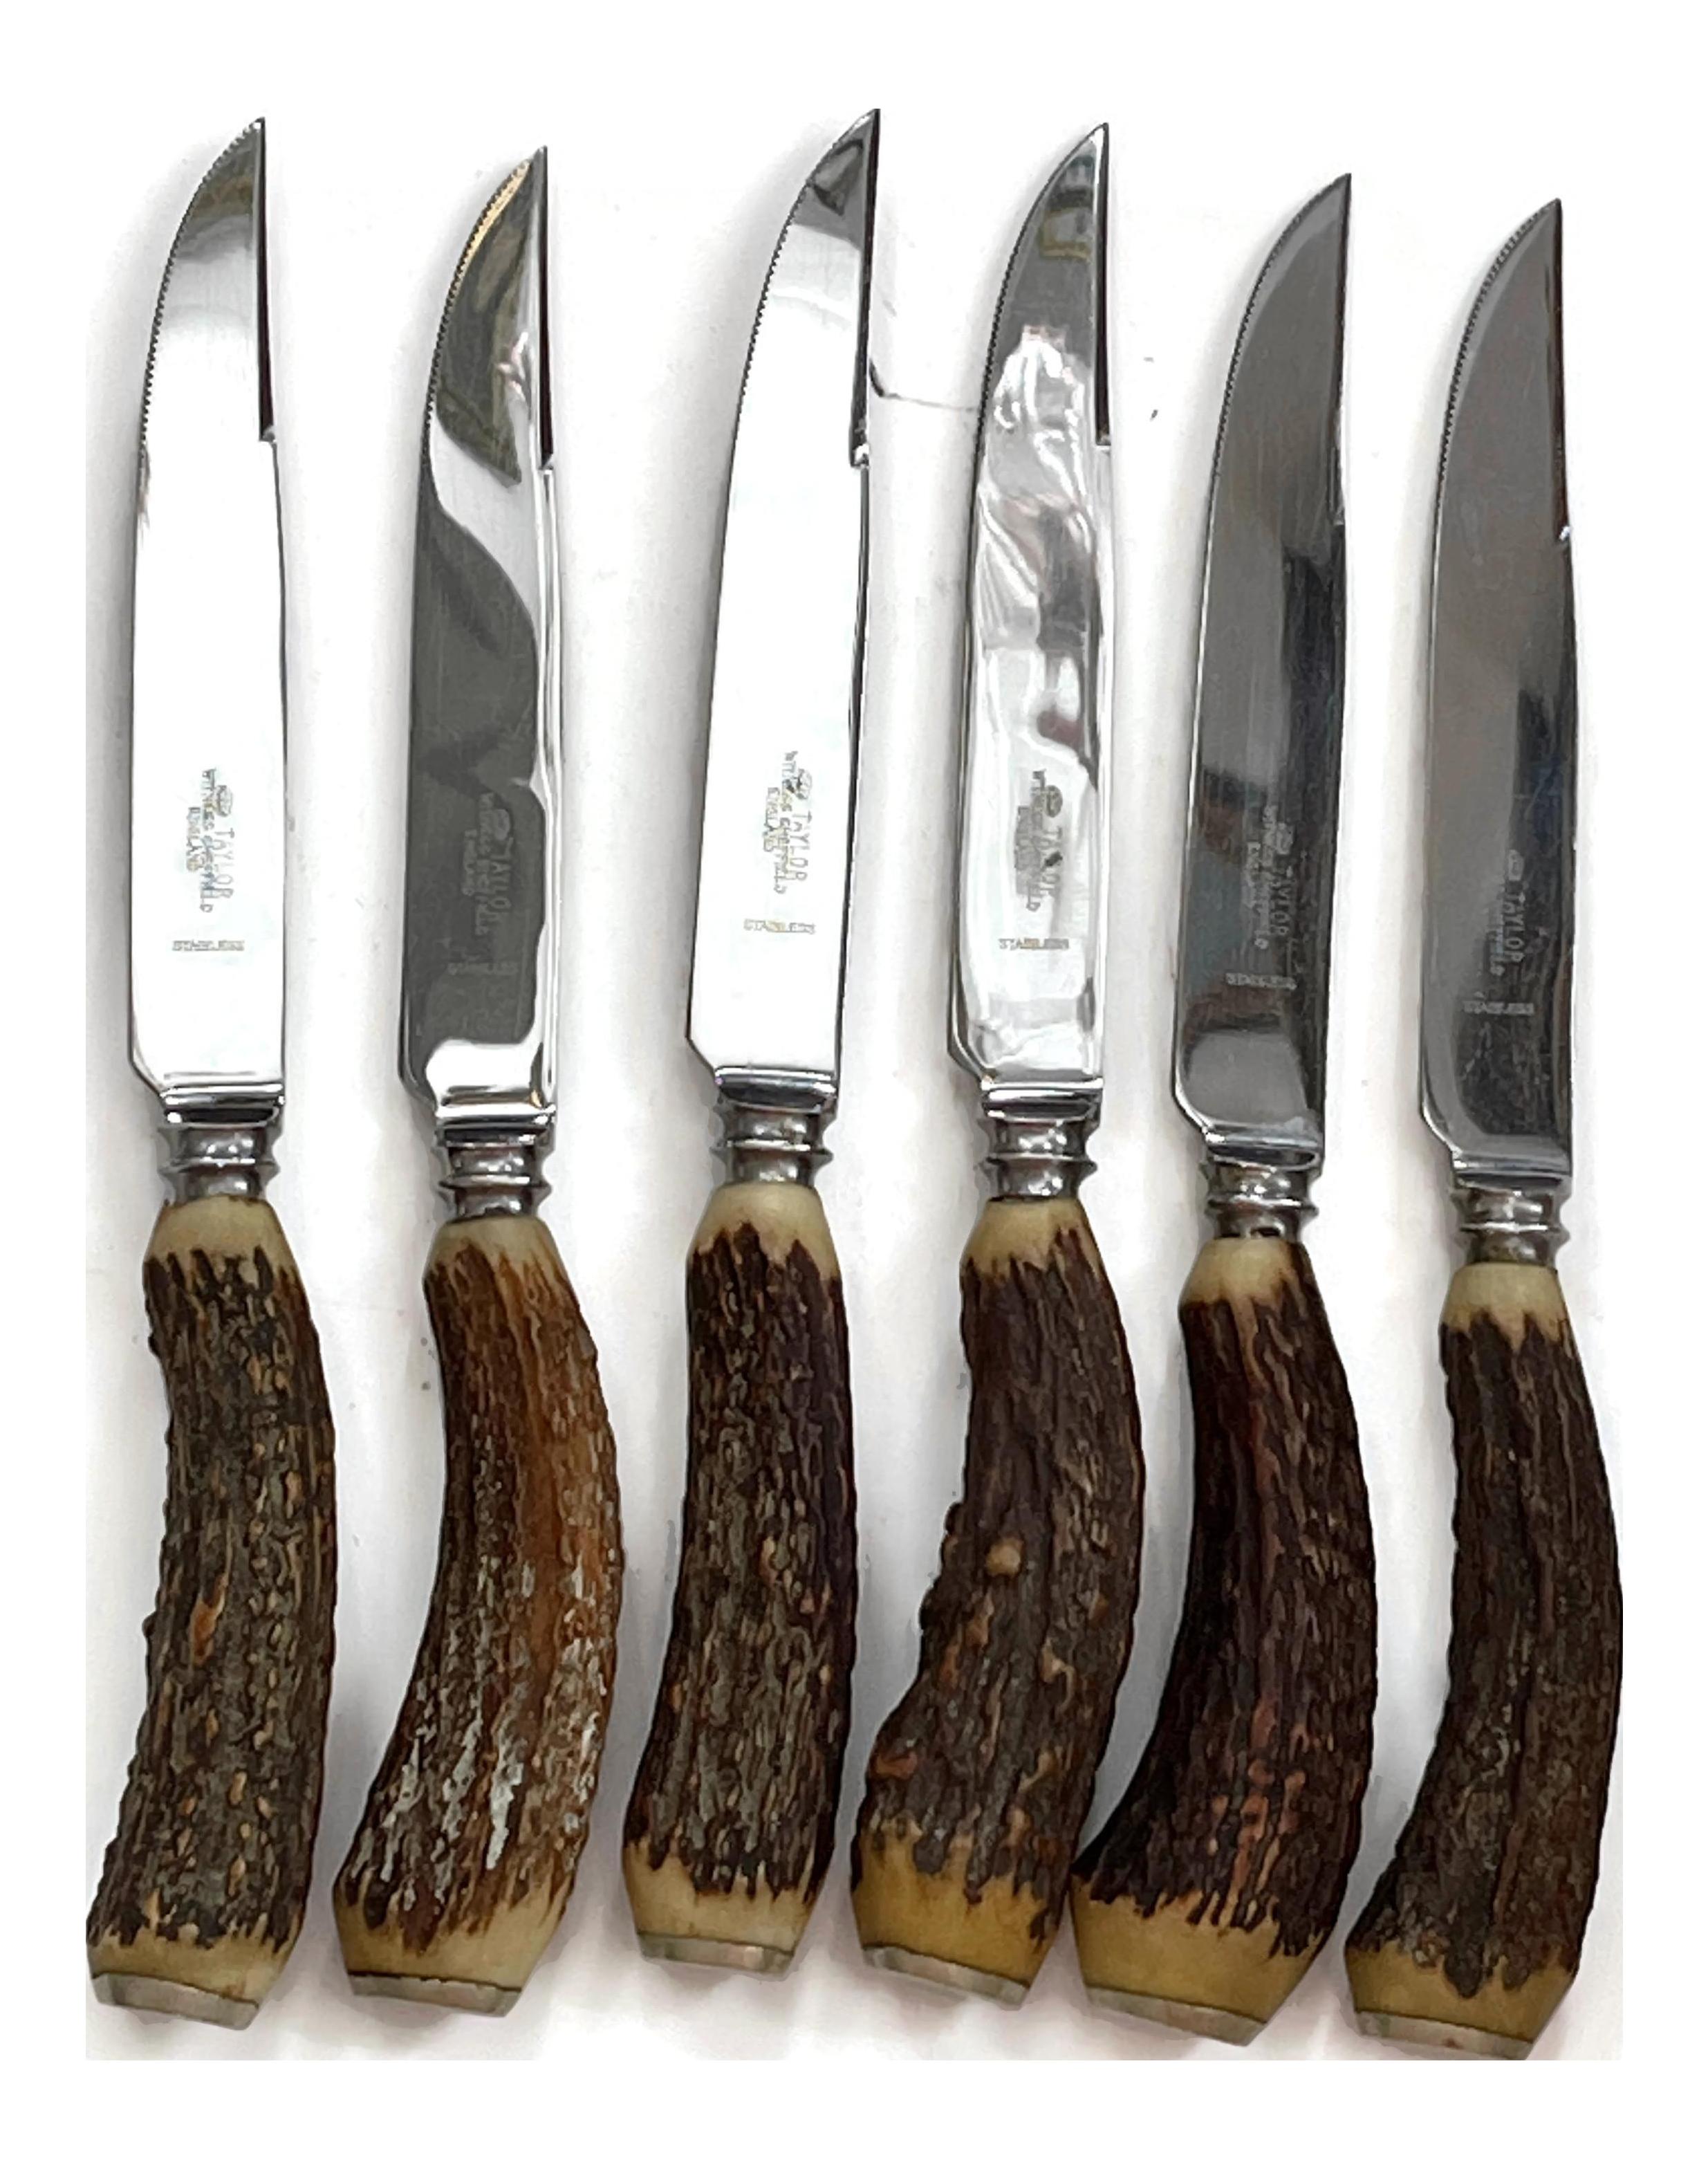 English Steak Knives Set of 6 Sheffield